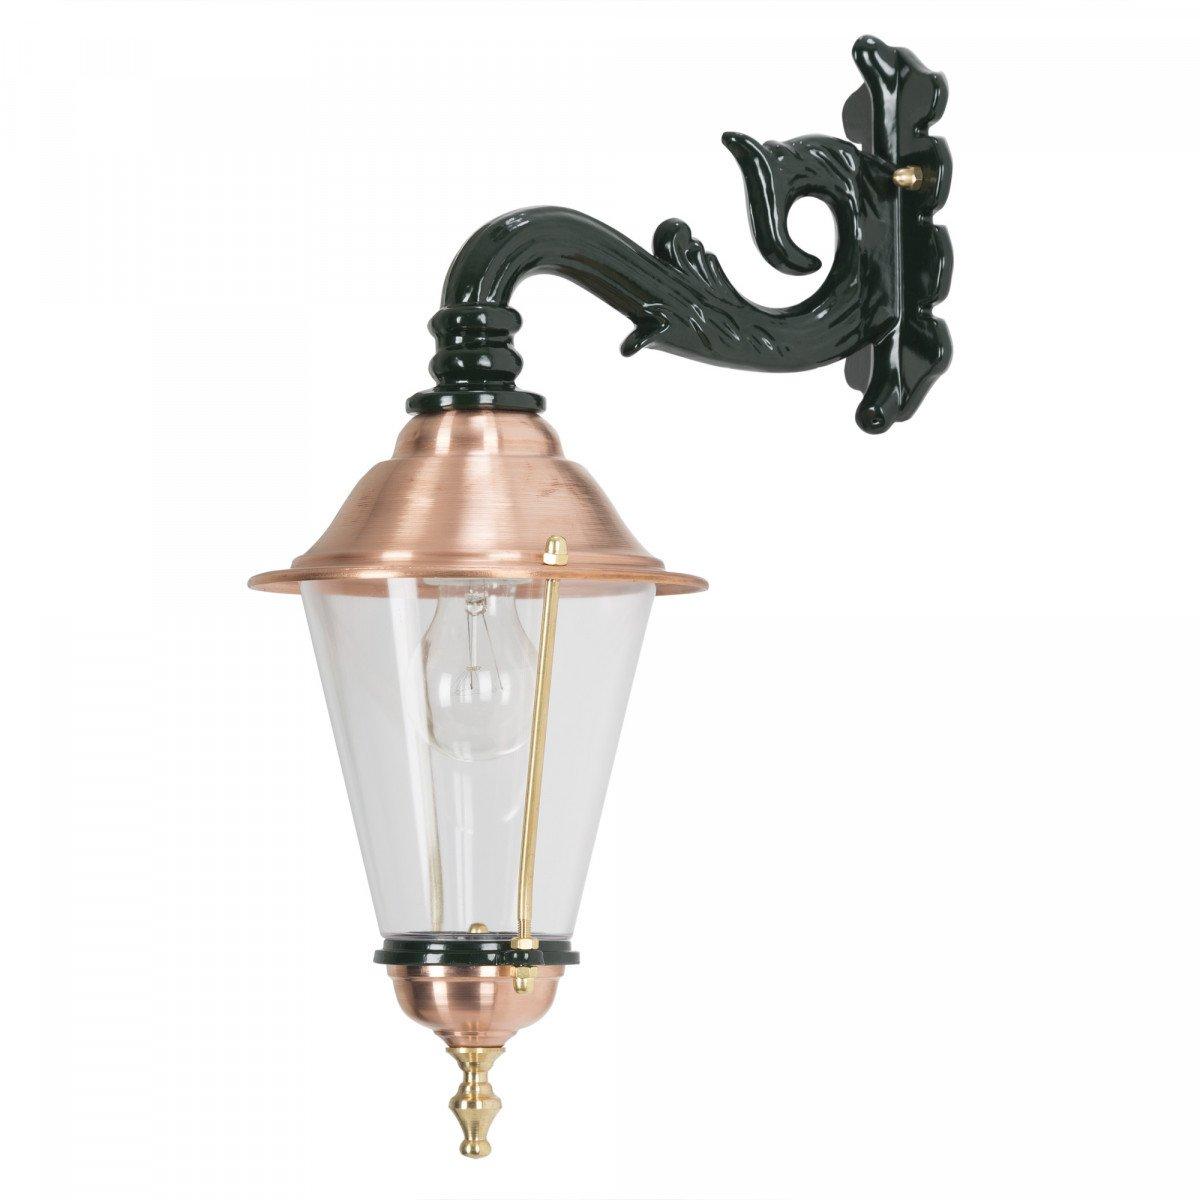 Historische Klassische Wandleuchte Hoorn Hängend mit Dämmerungssensor LED